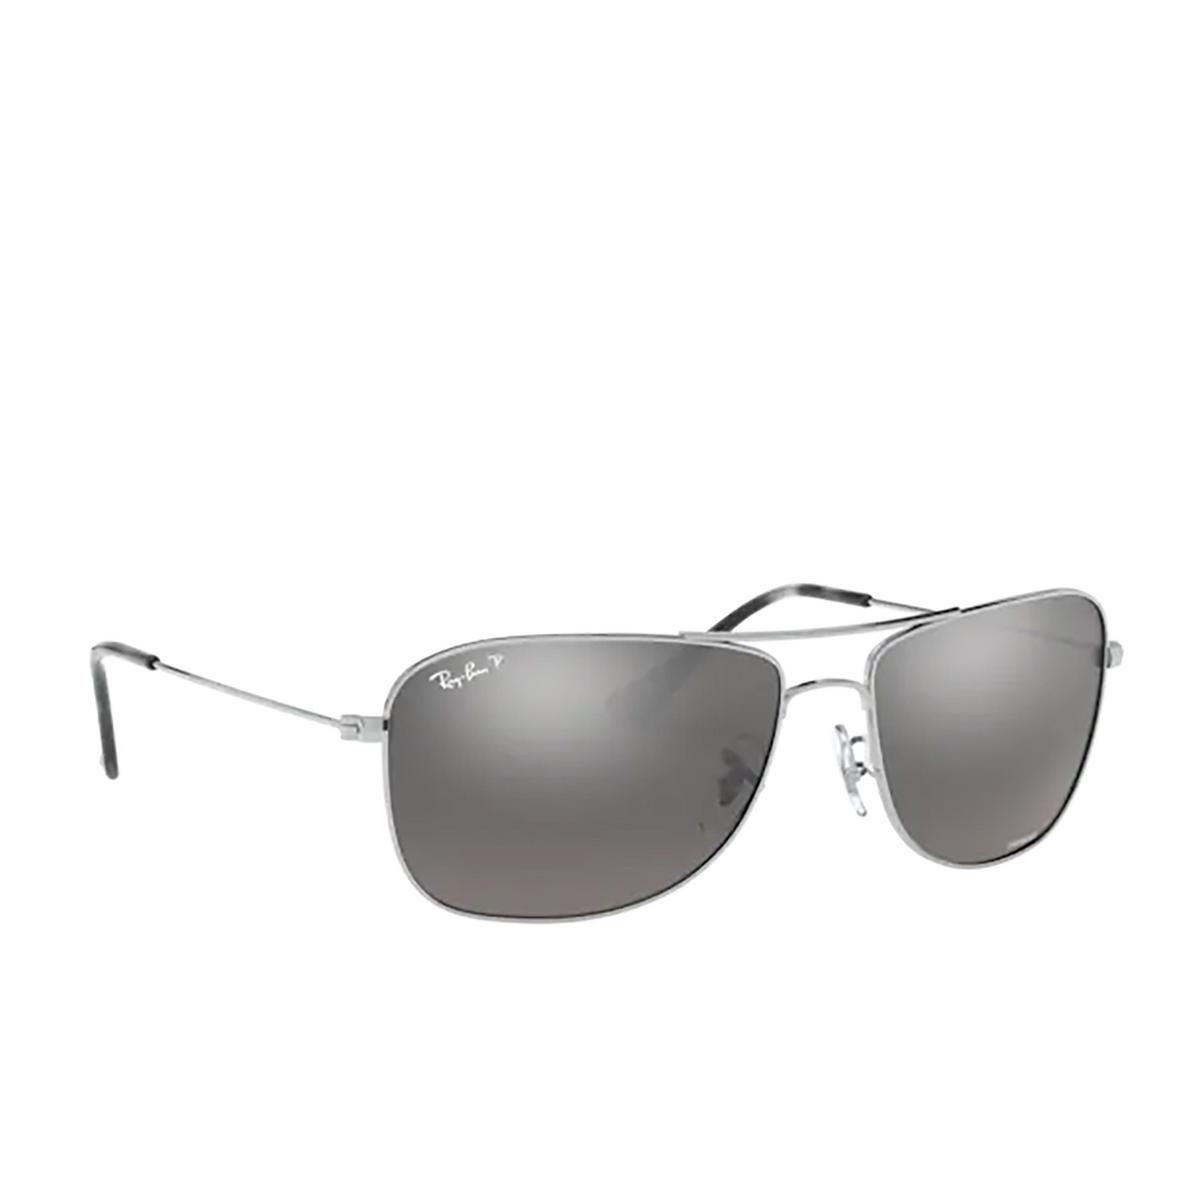 Ray-Ban® Aviator Sunglasses: RB3543 color Silver 003/5J - 2/3.